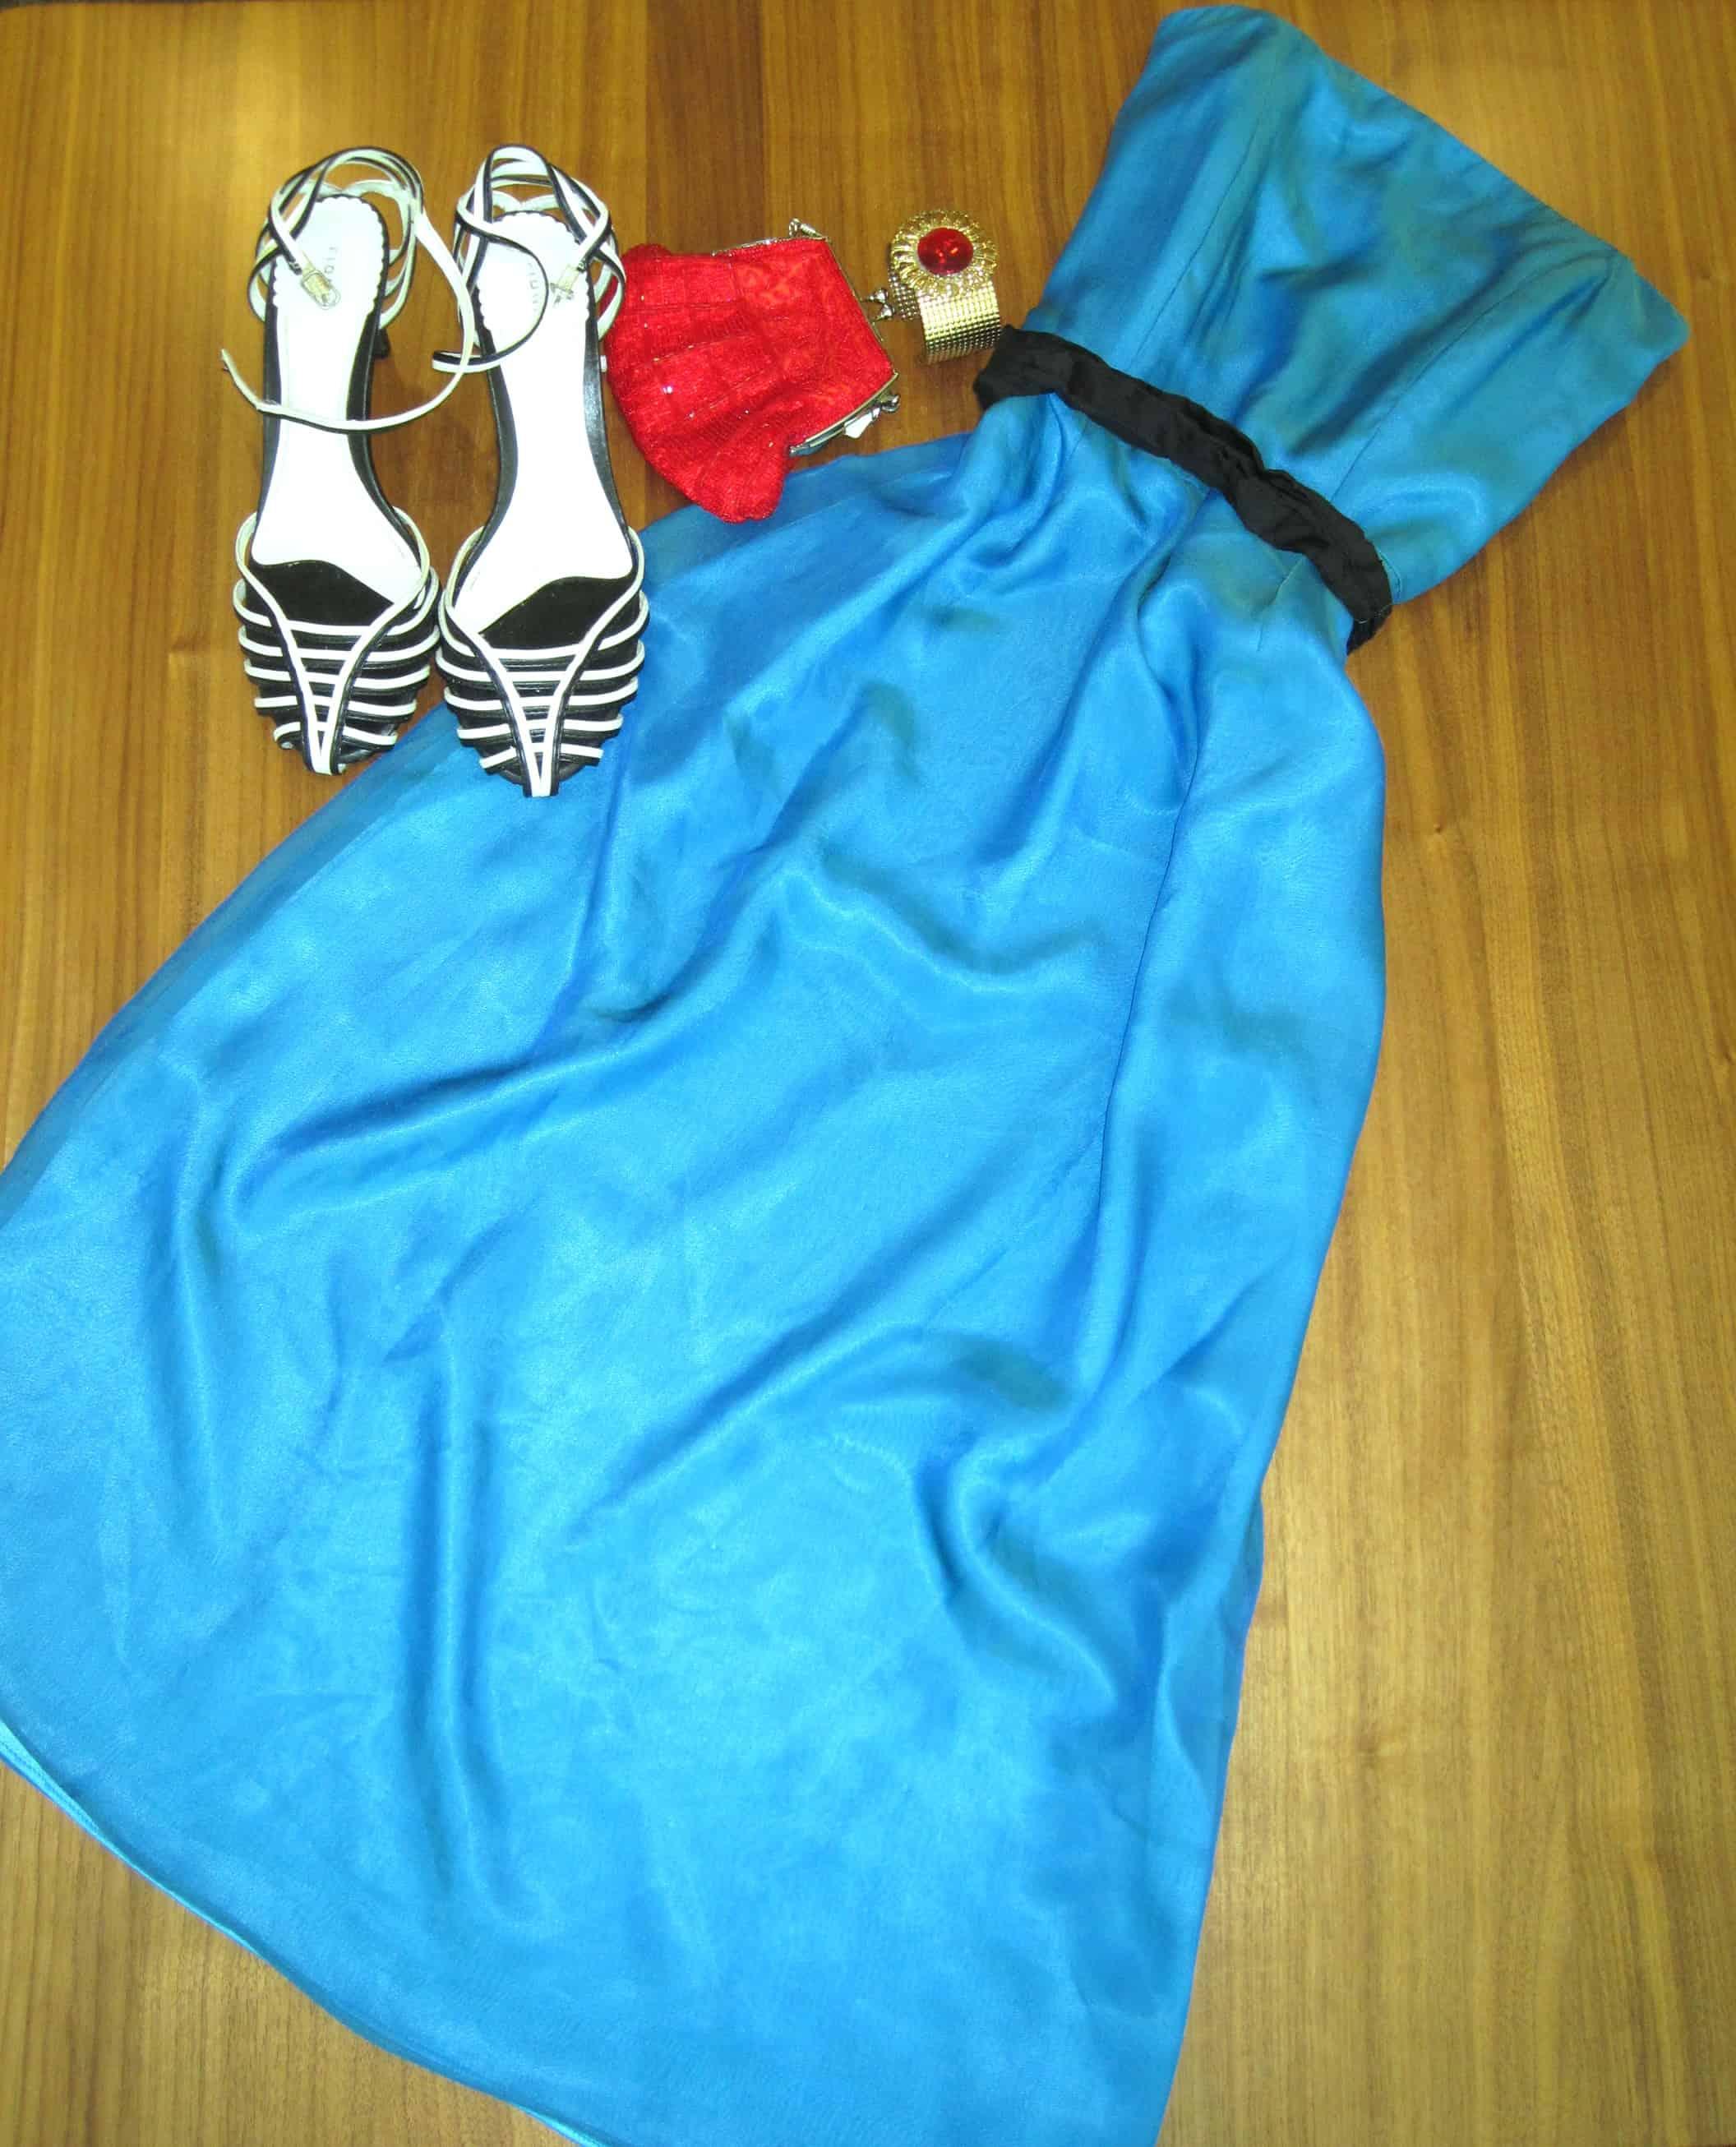 Thrift Shop Prom Dresses - Holiday Dresses